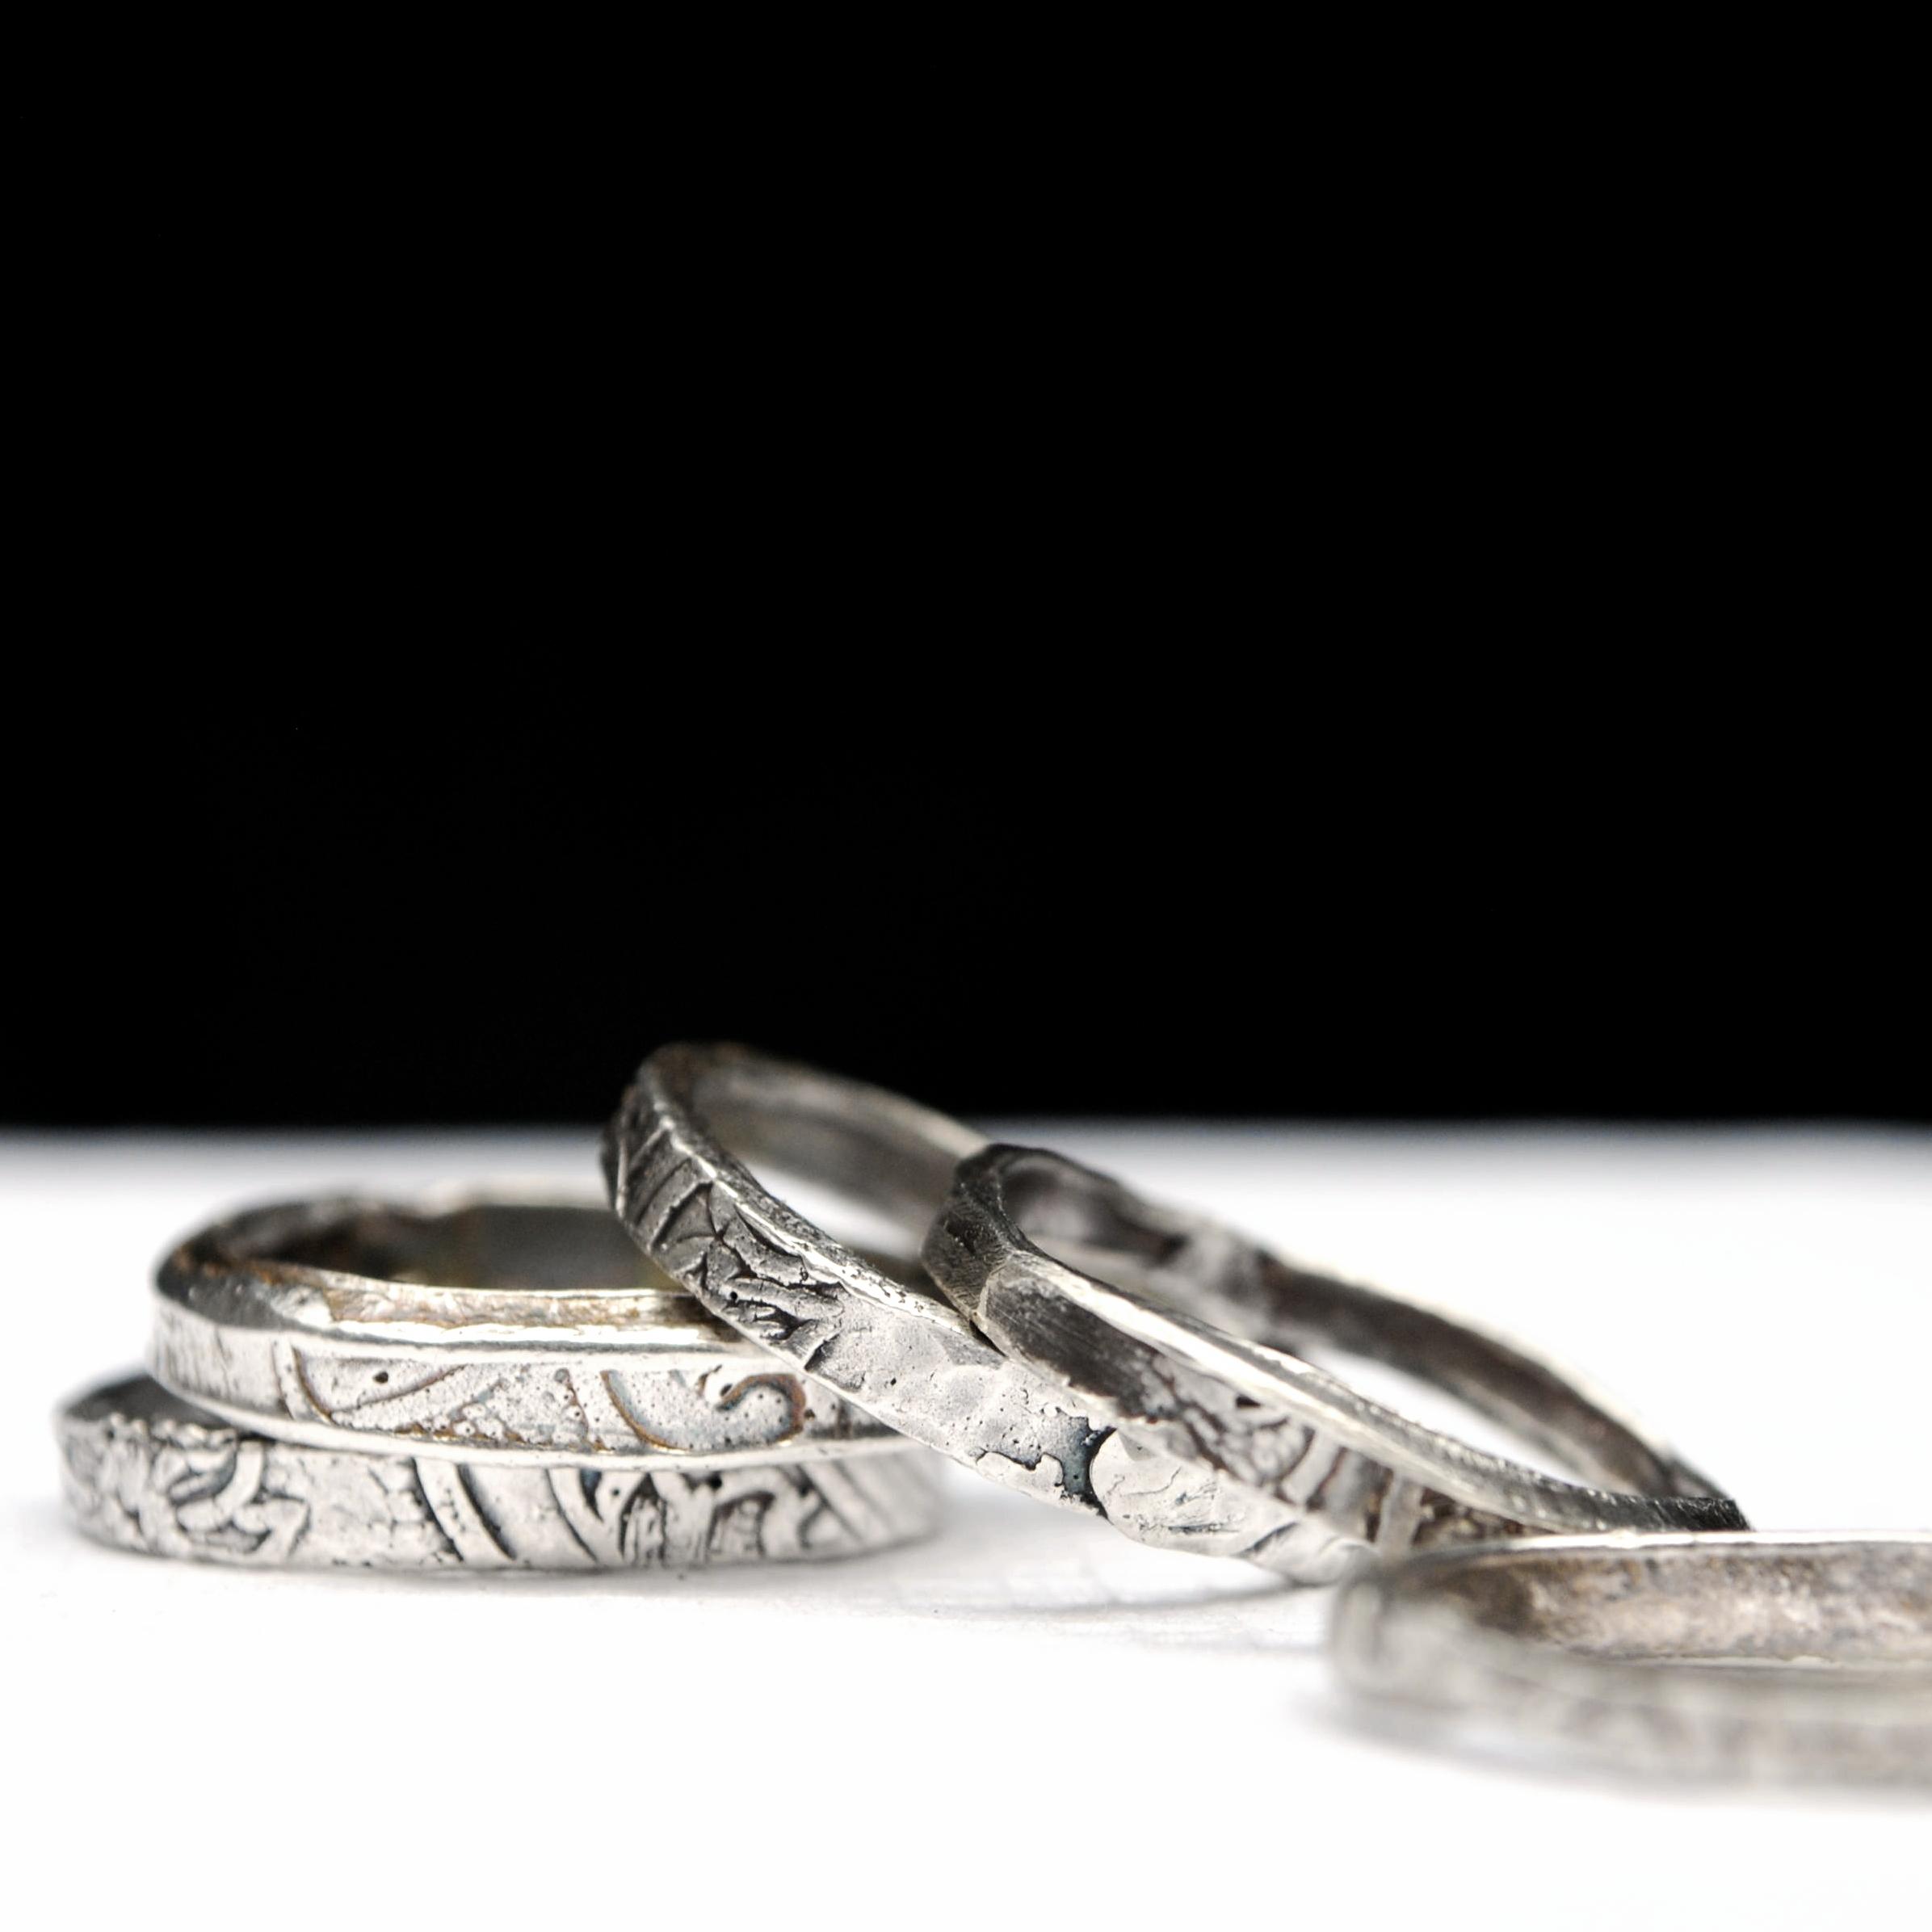 artefact - 180419 - tea ring stack 02.jpg